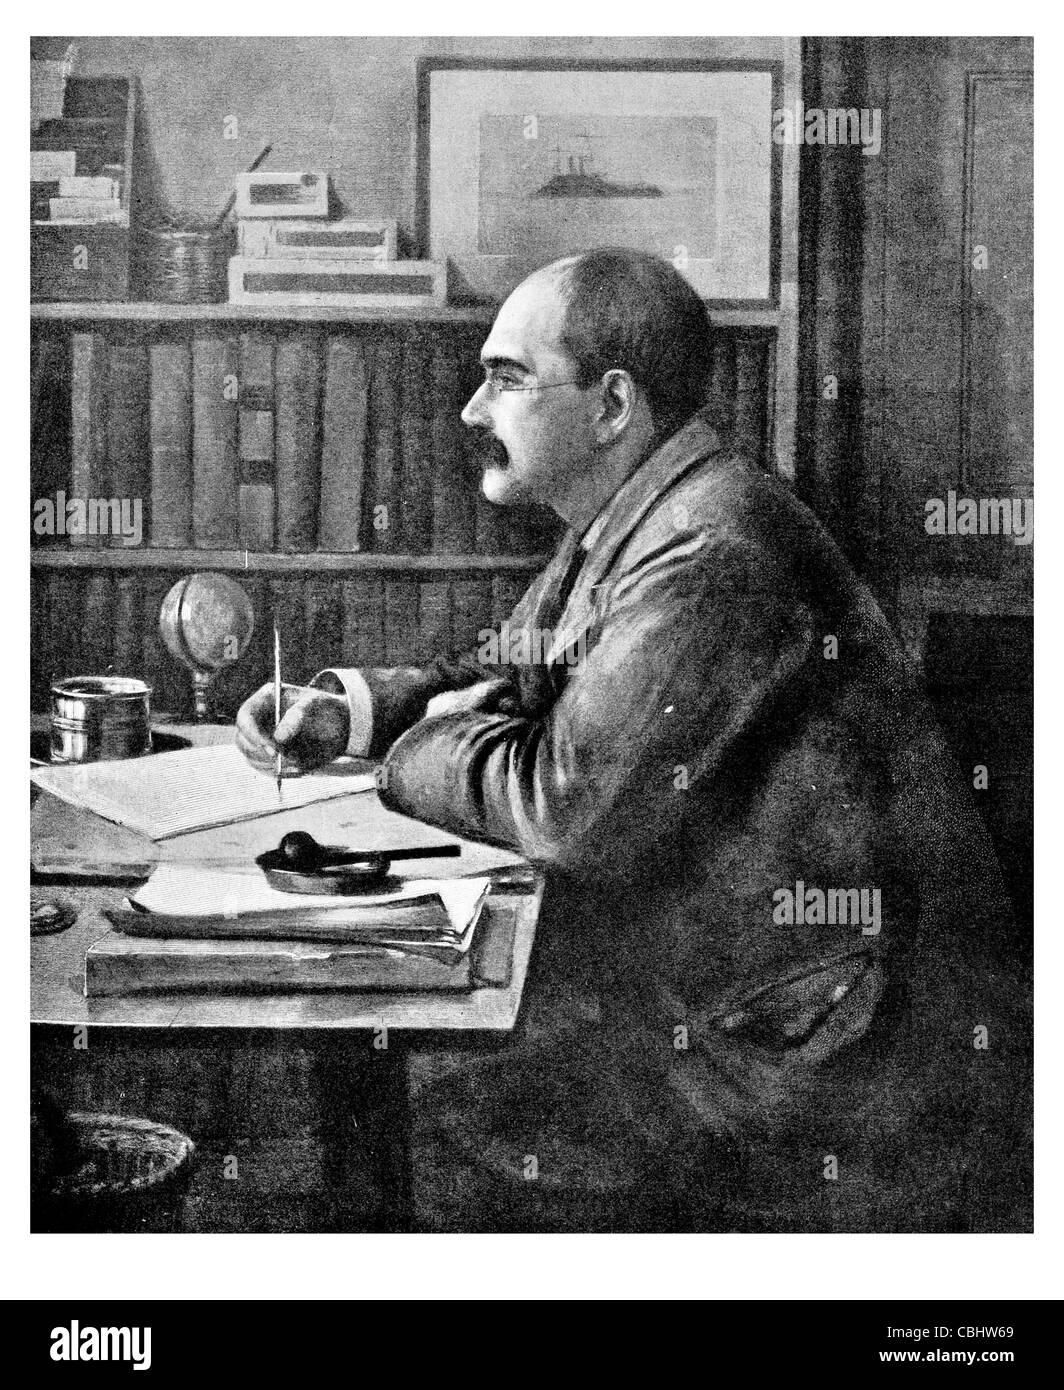 Joseph Rudyard Kipling 1865 1936 English poet short story writer Nobel Prize Literature The Jungle Book author Stock Photo